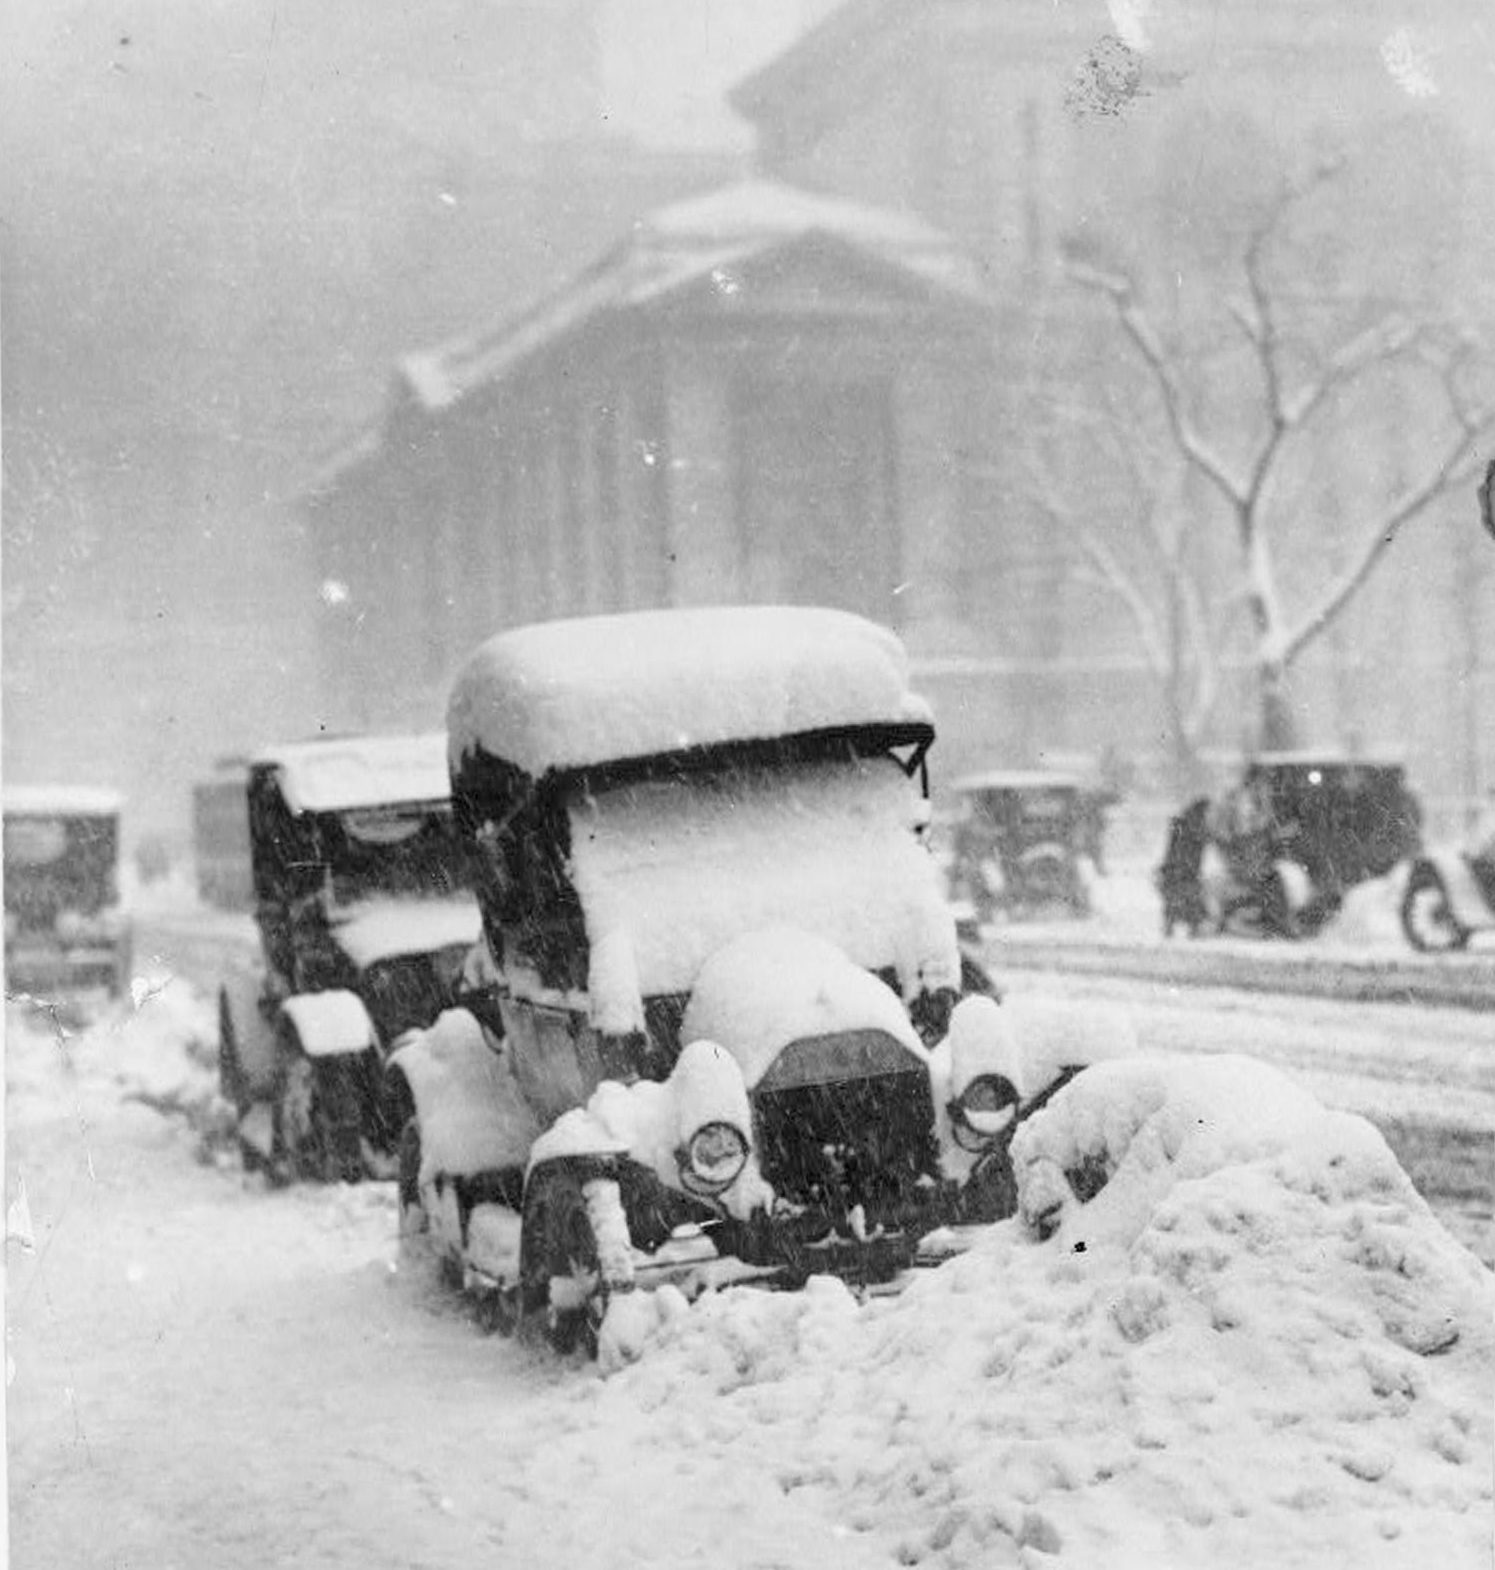 Snowbound automobiles NYC